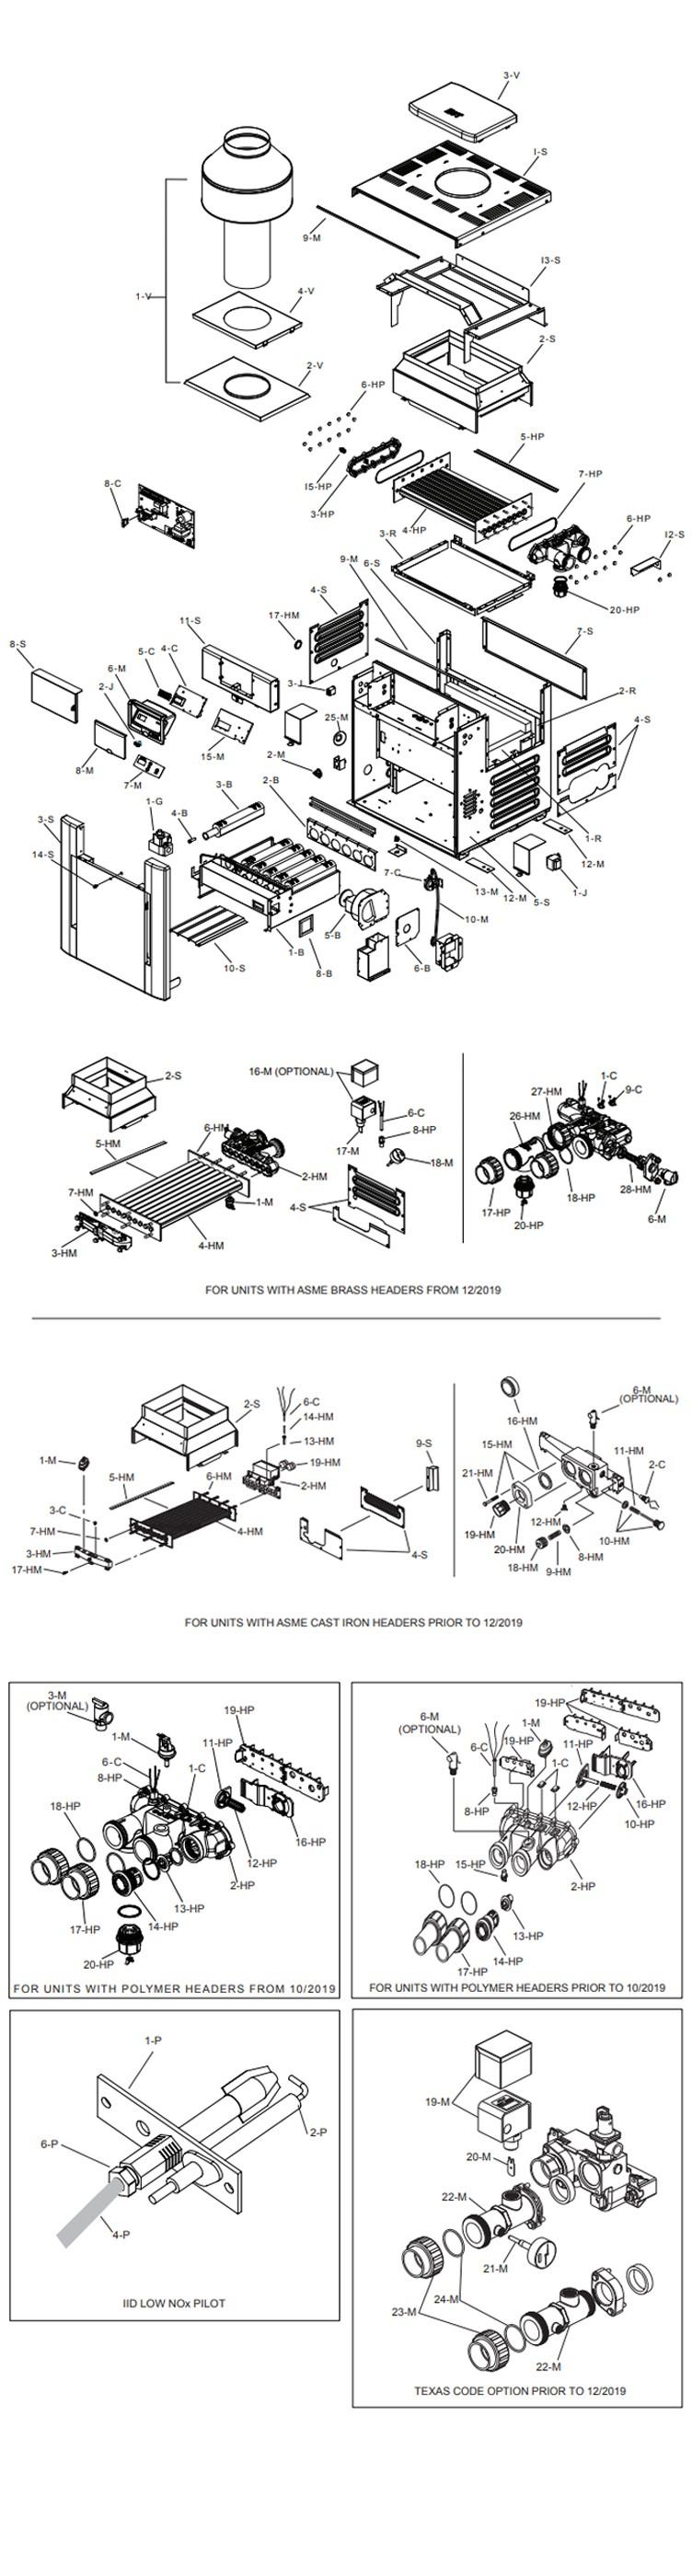 Raypak Digital Low NOx ASME Natural Gas Commercial Swimming Pool Heater   200k BTU Cupro Nickel Heat Exchanger   Altitude 0-5000 Ft   C-R207A-EN-X 010227   B-R207AL-EN-X #26 017709 Parts Schematic